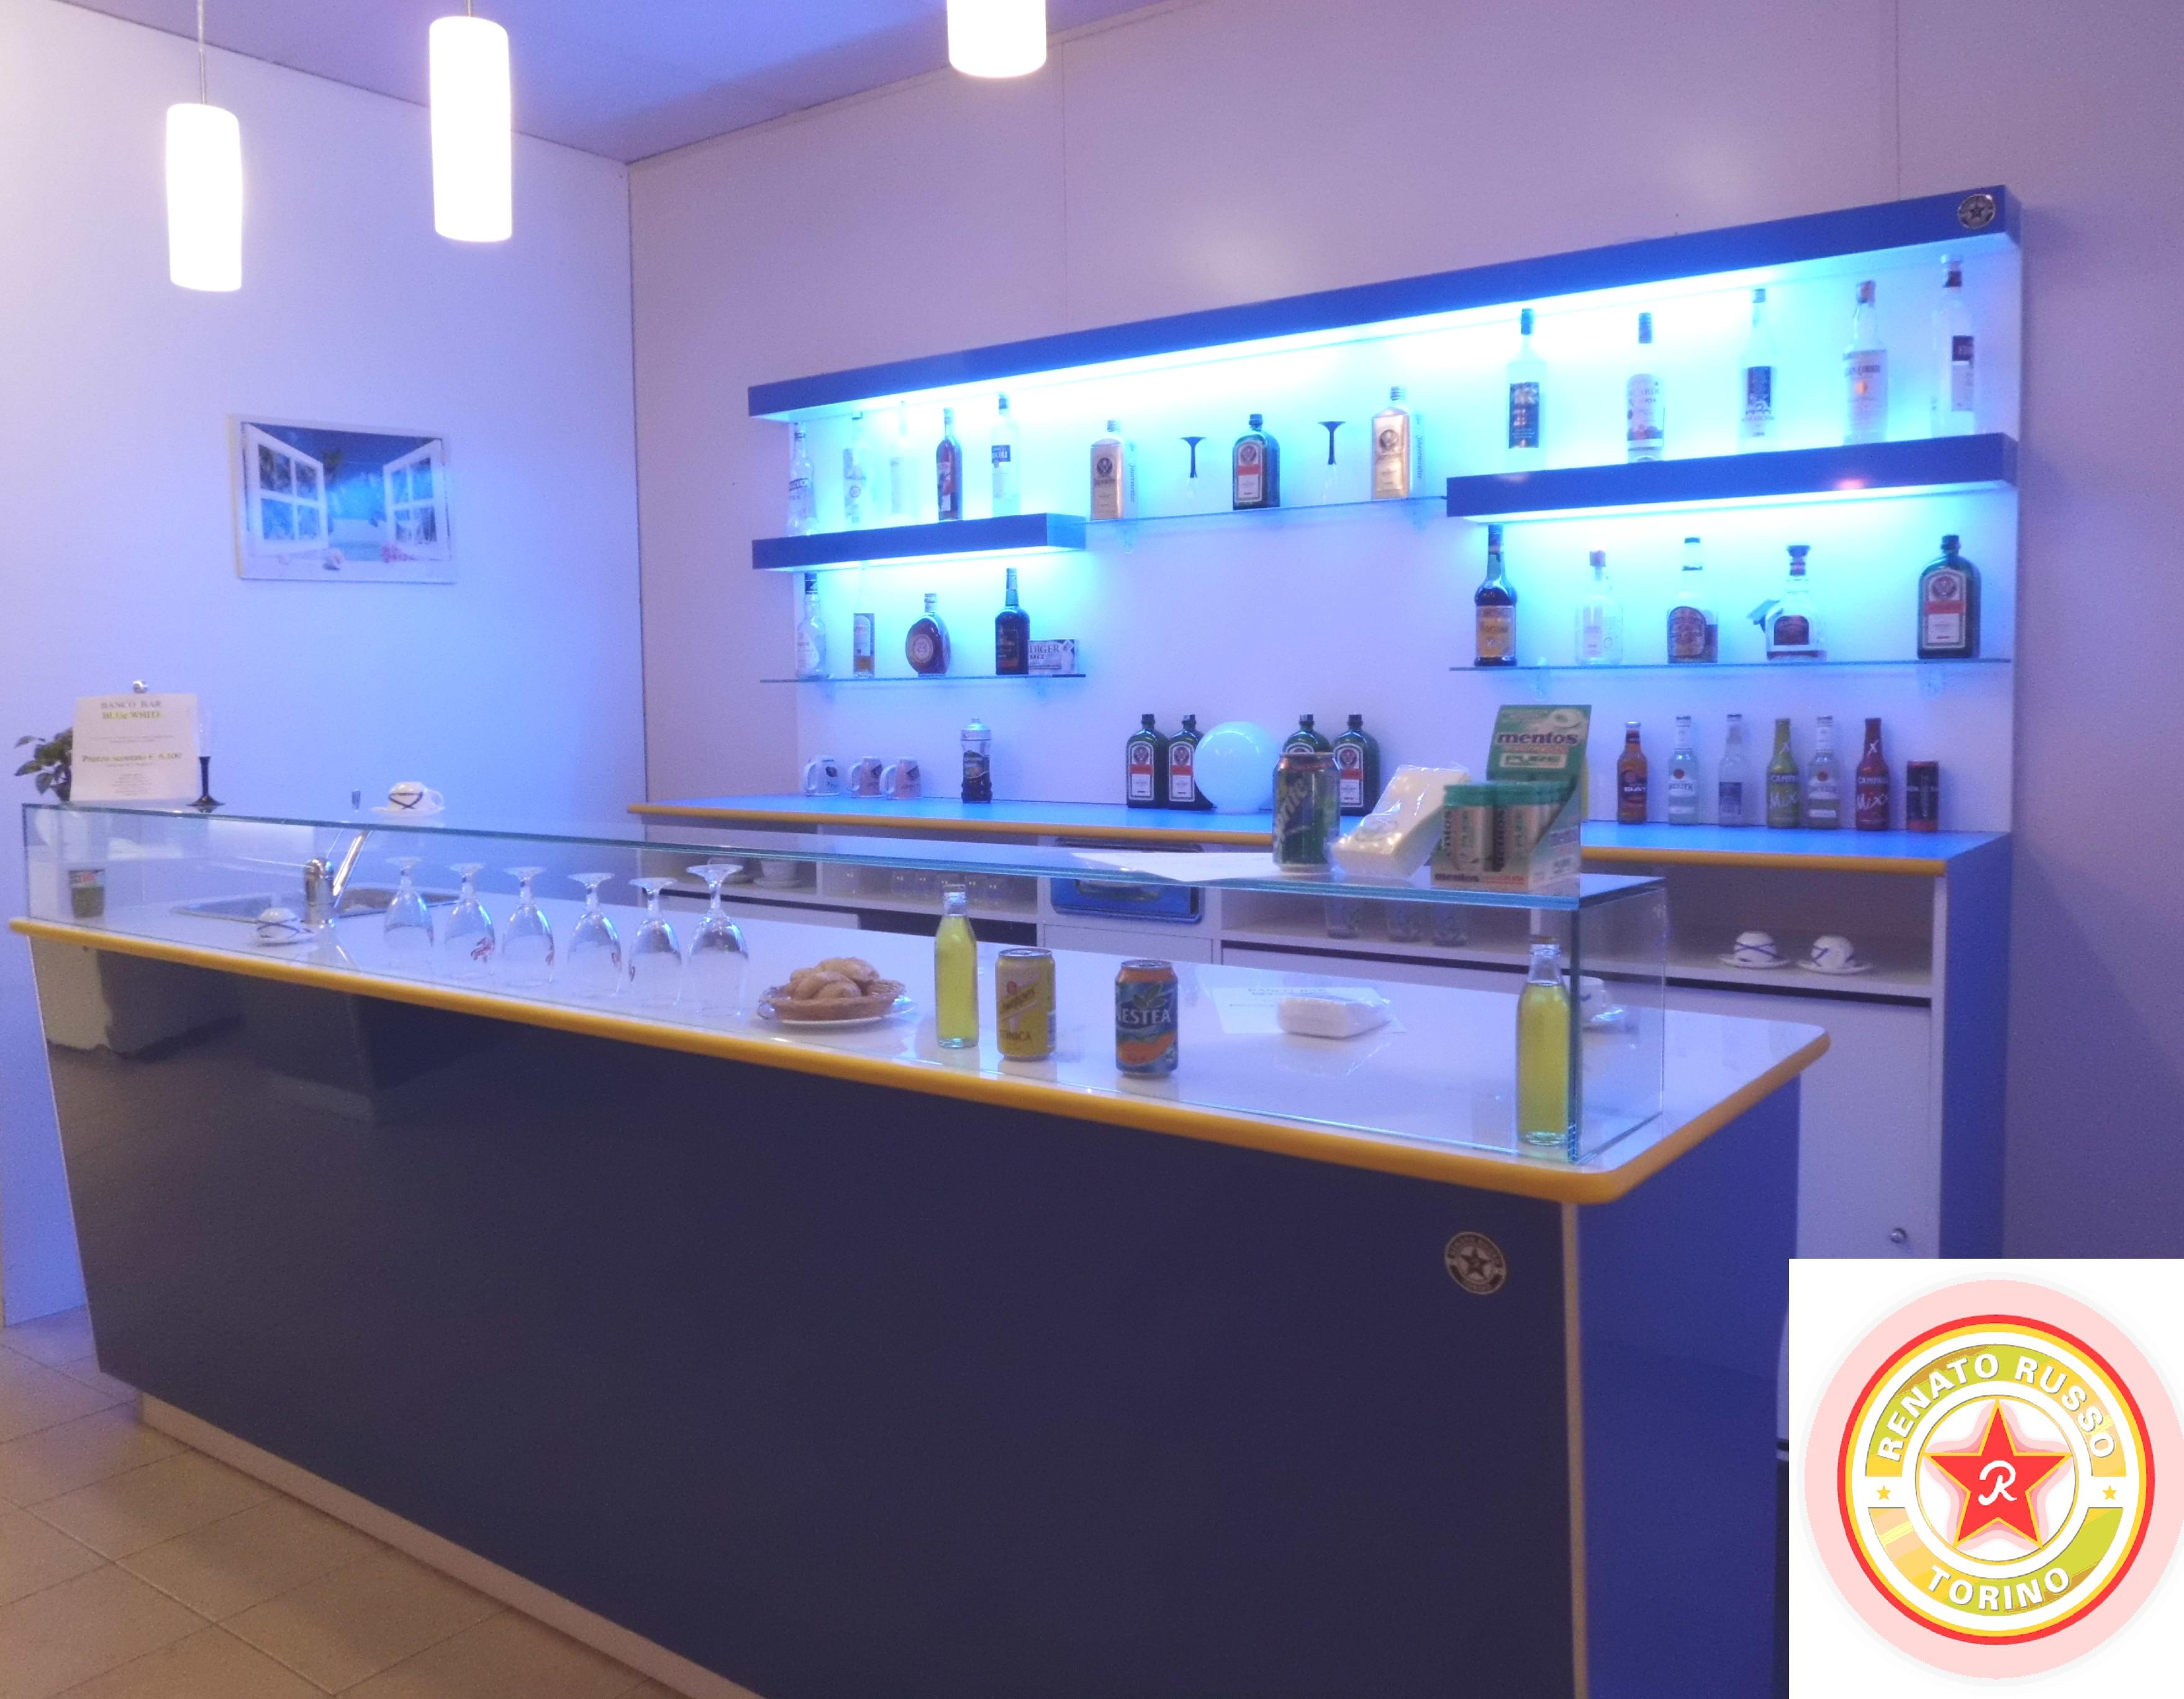 Banco bar bologna compra in fabbrica banconi bar for Arredamento bar usato milano